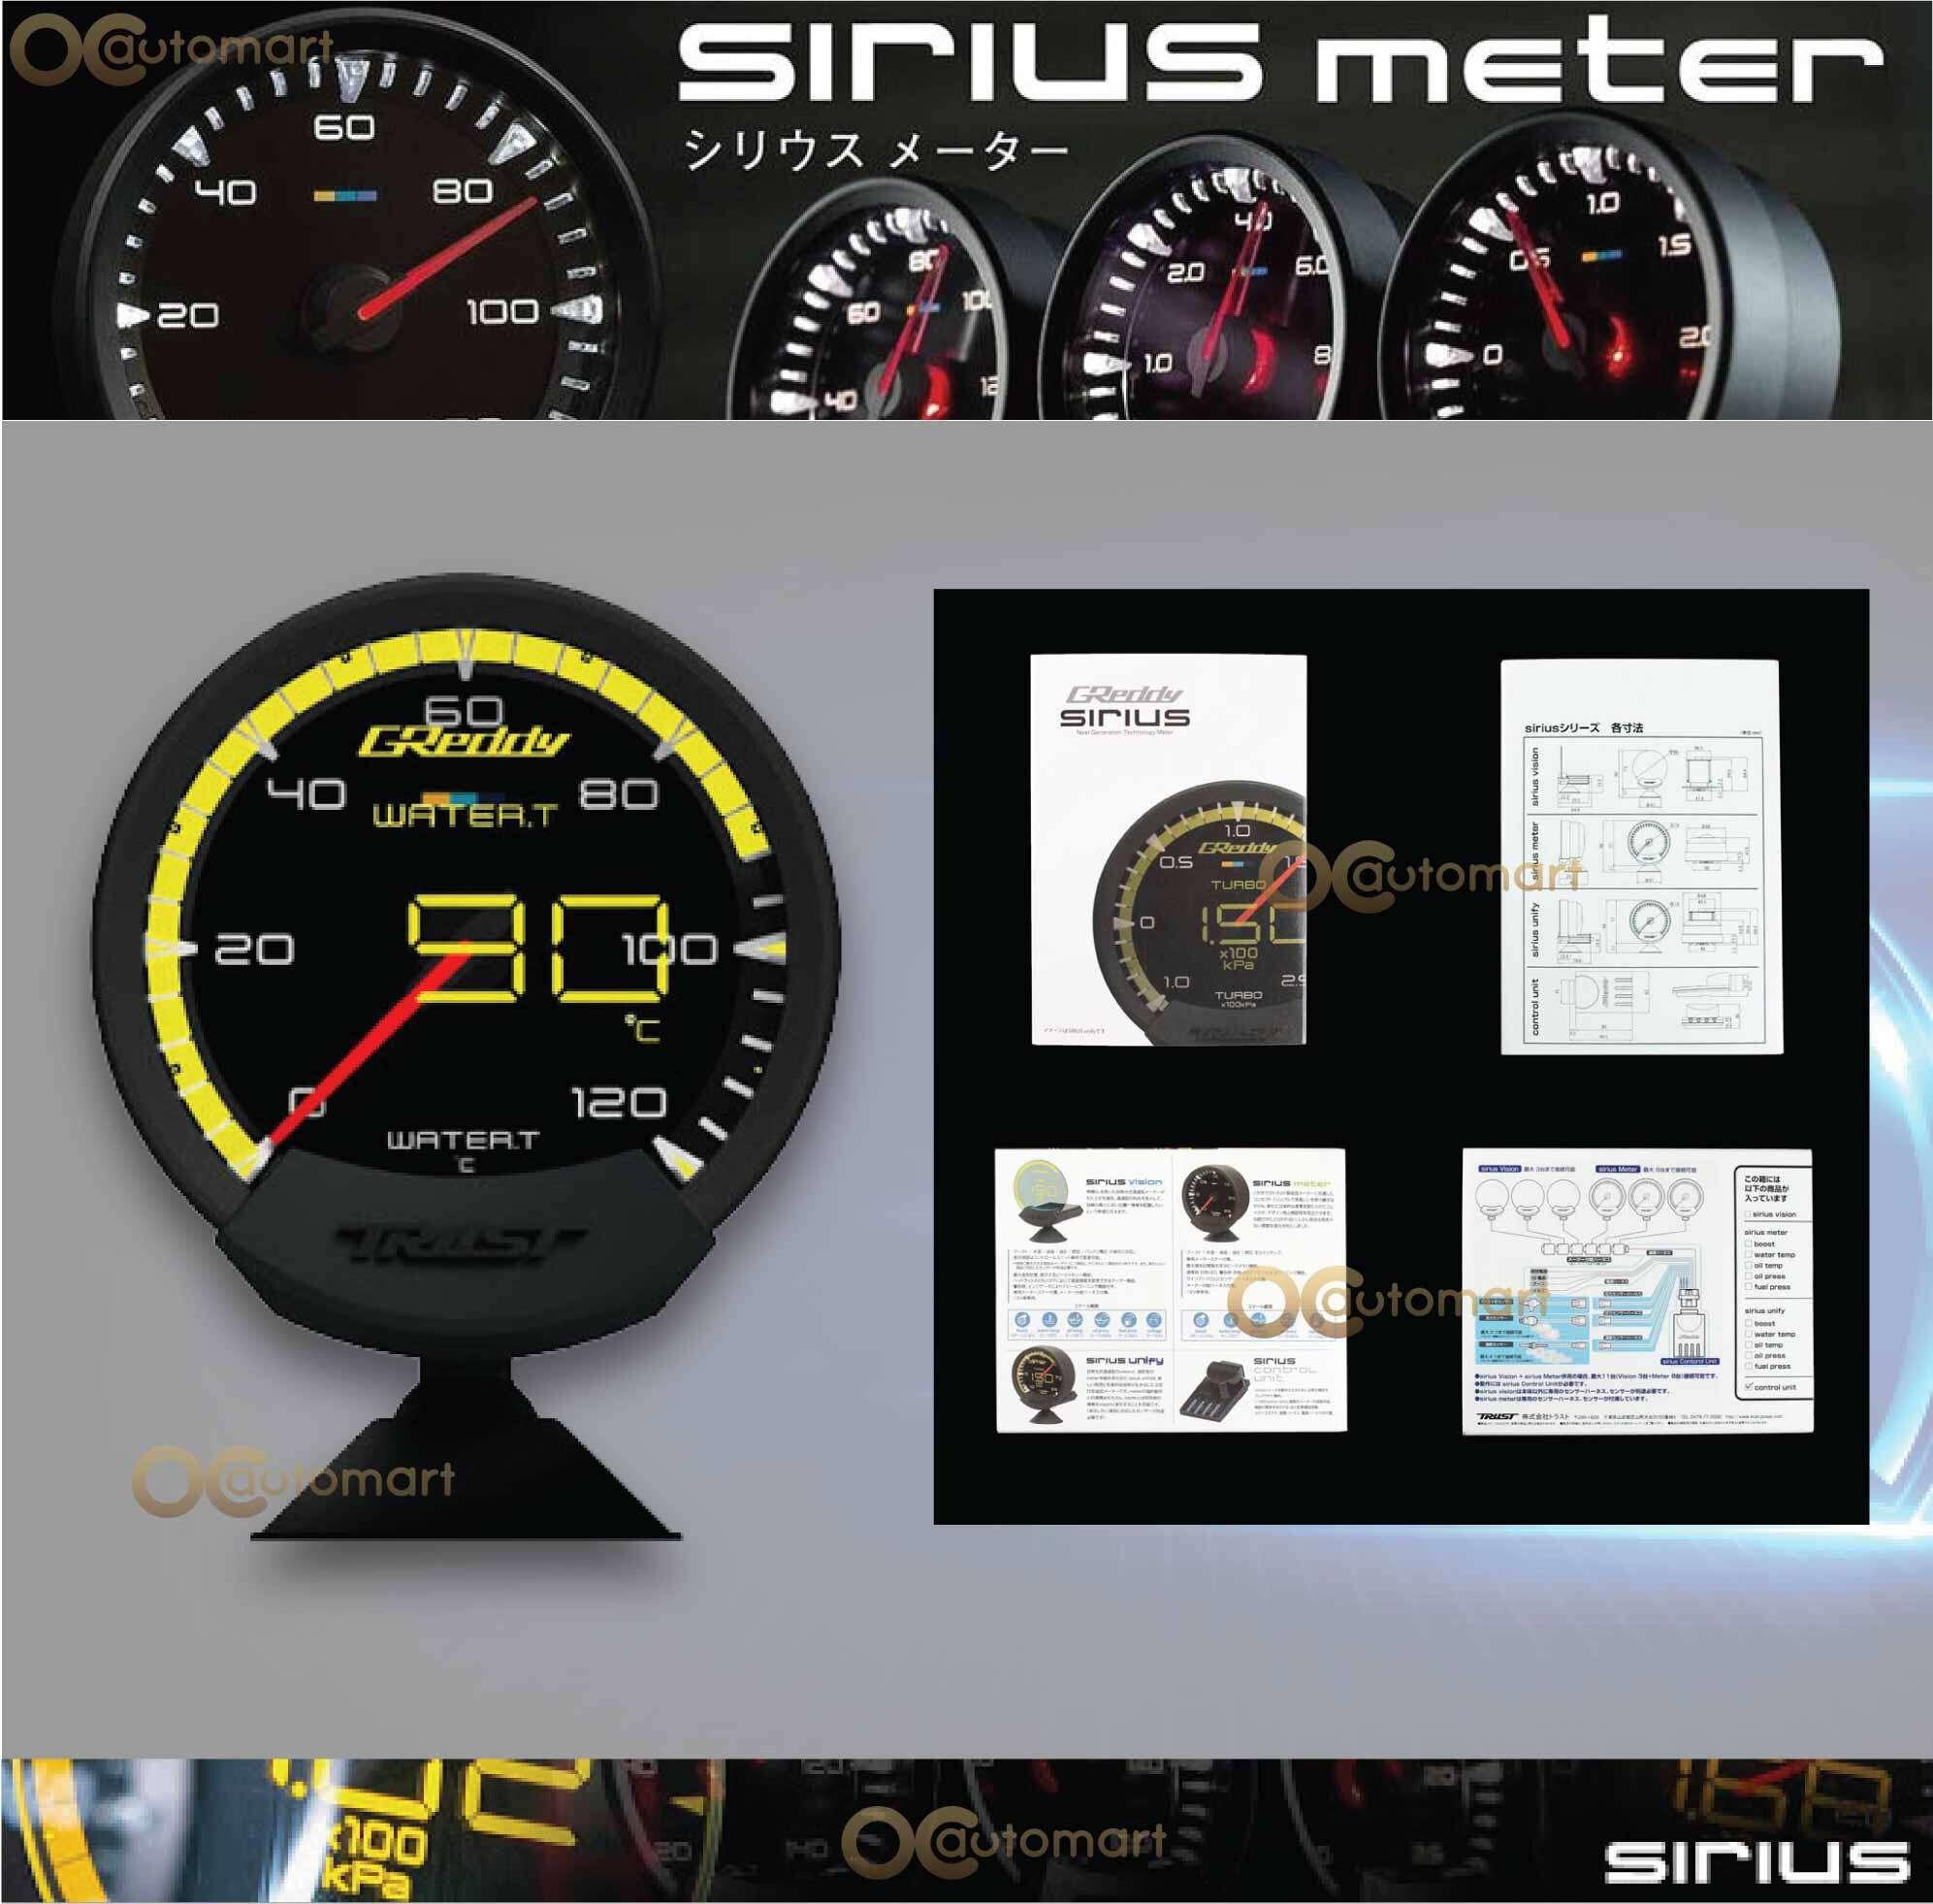 Greddy Sirius Meter Series Trust 7 Colors Water temp Oil Temp Oil Press Turbo Boost RPM Voltage Car Gauge With Sensors